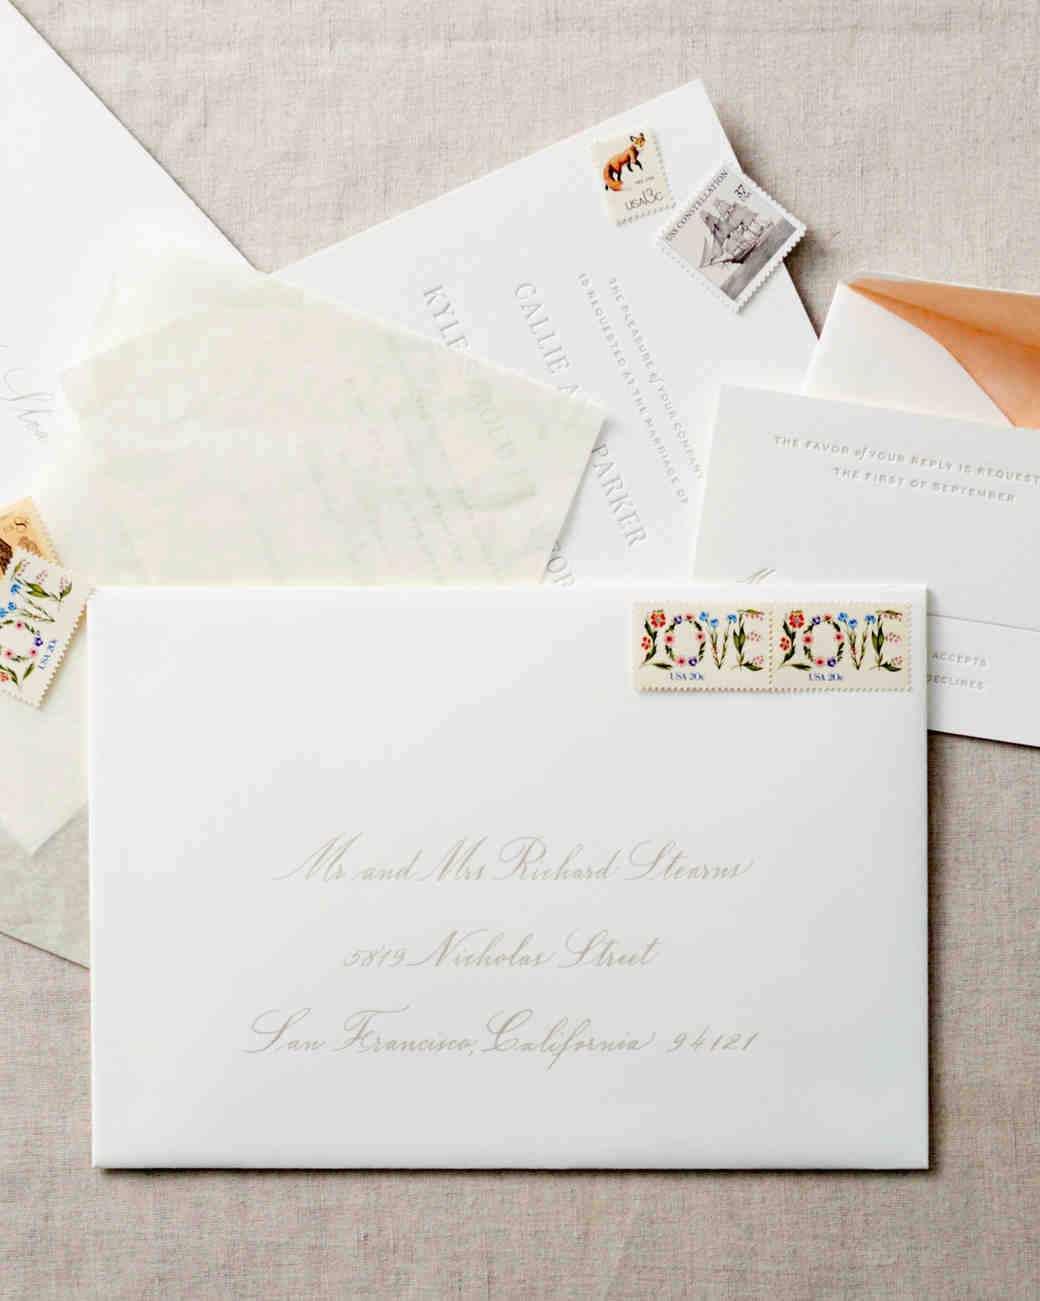 97 Blank Invitation Card Envelope Writing PSD File for Invitation Card Envelope Writing